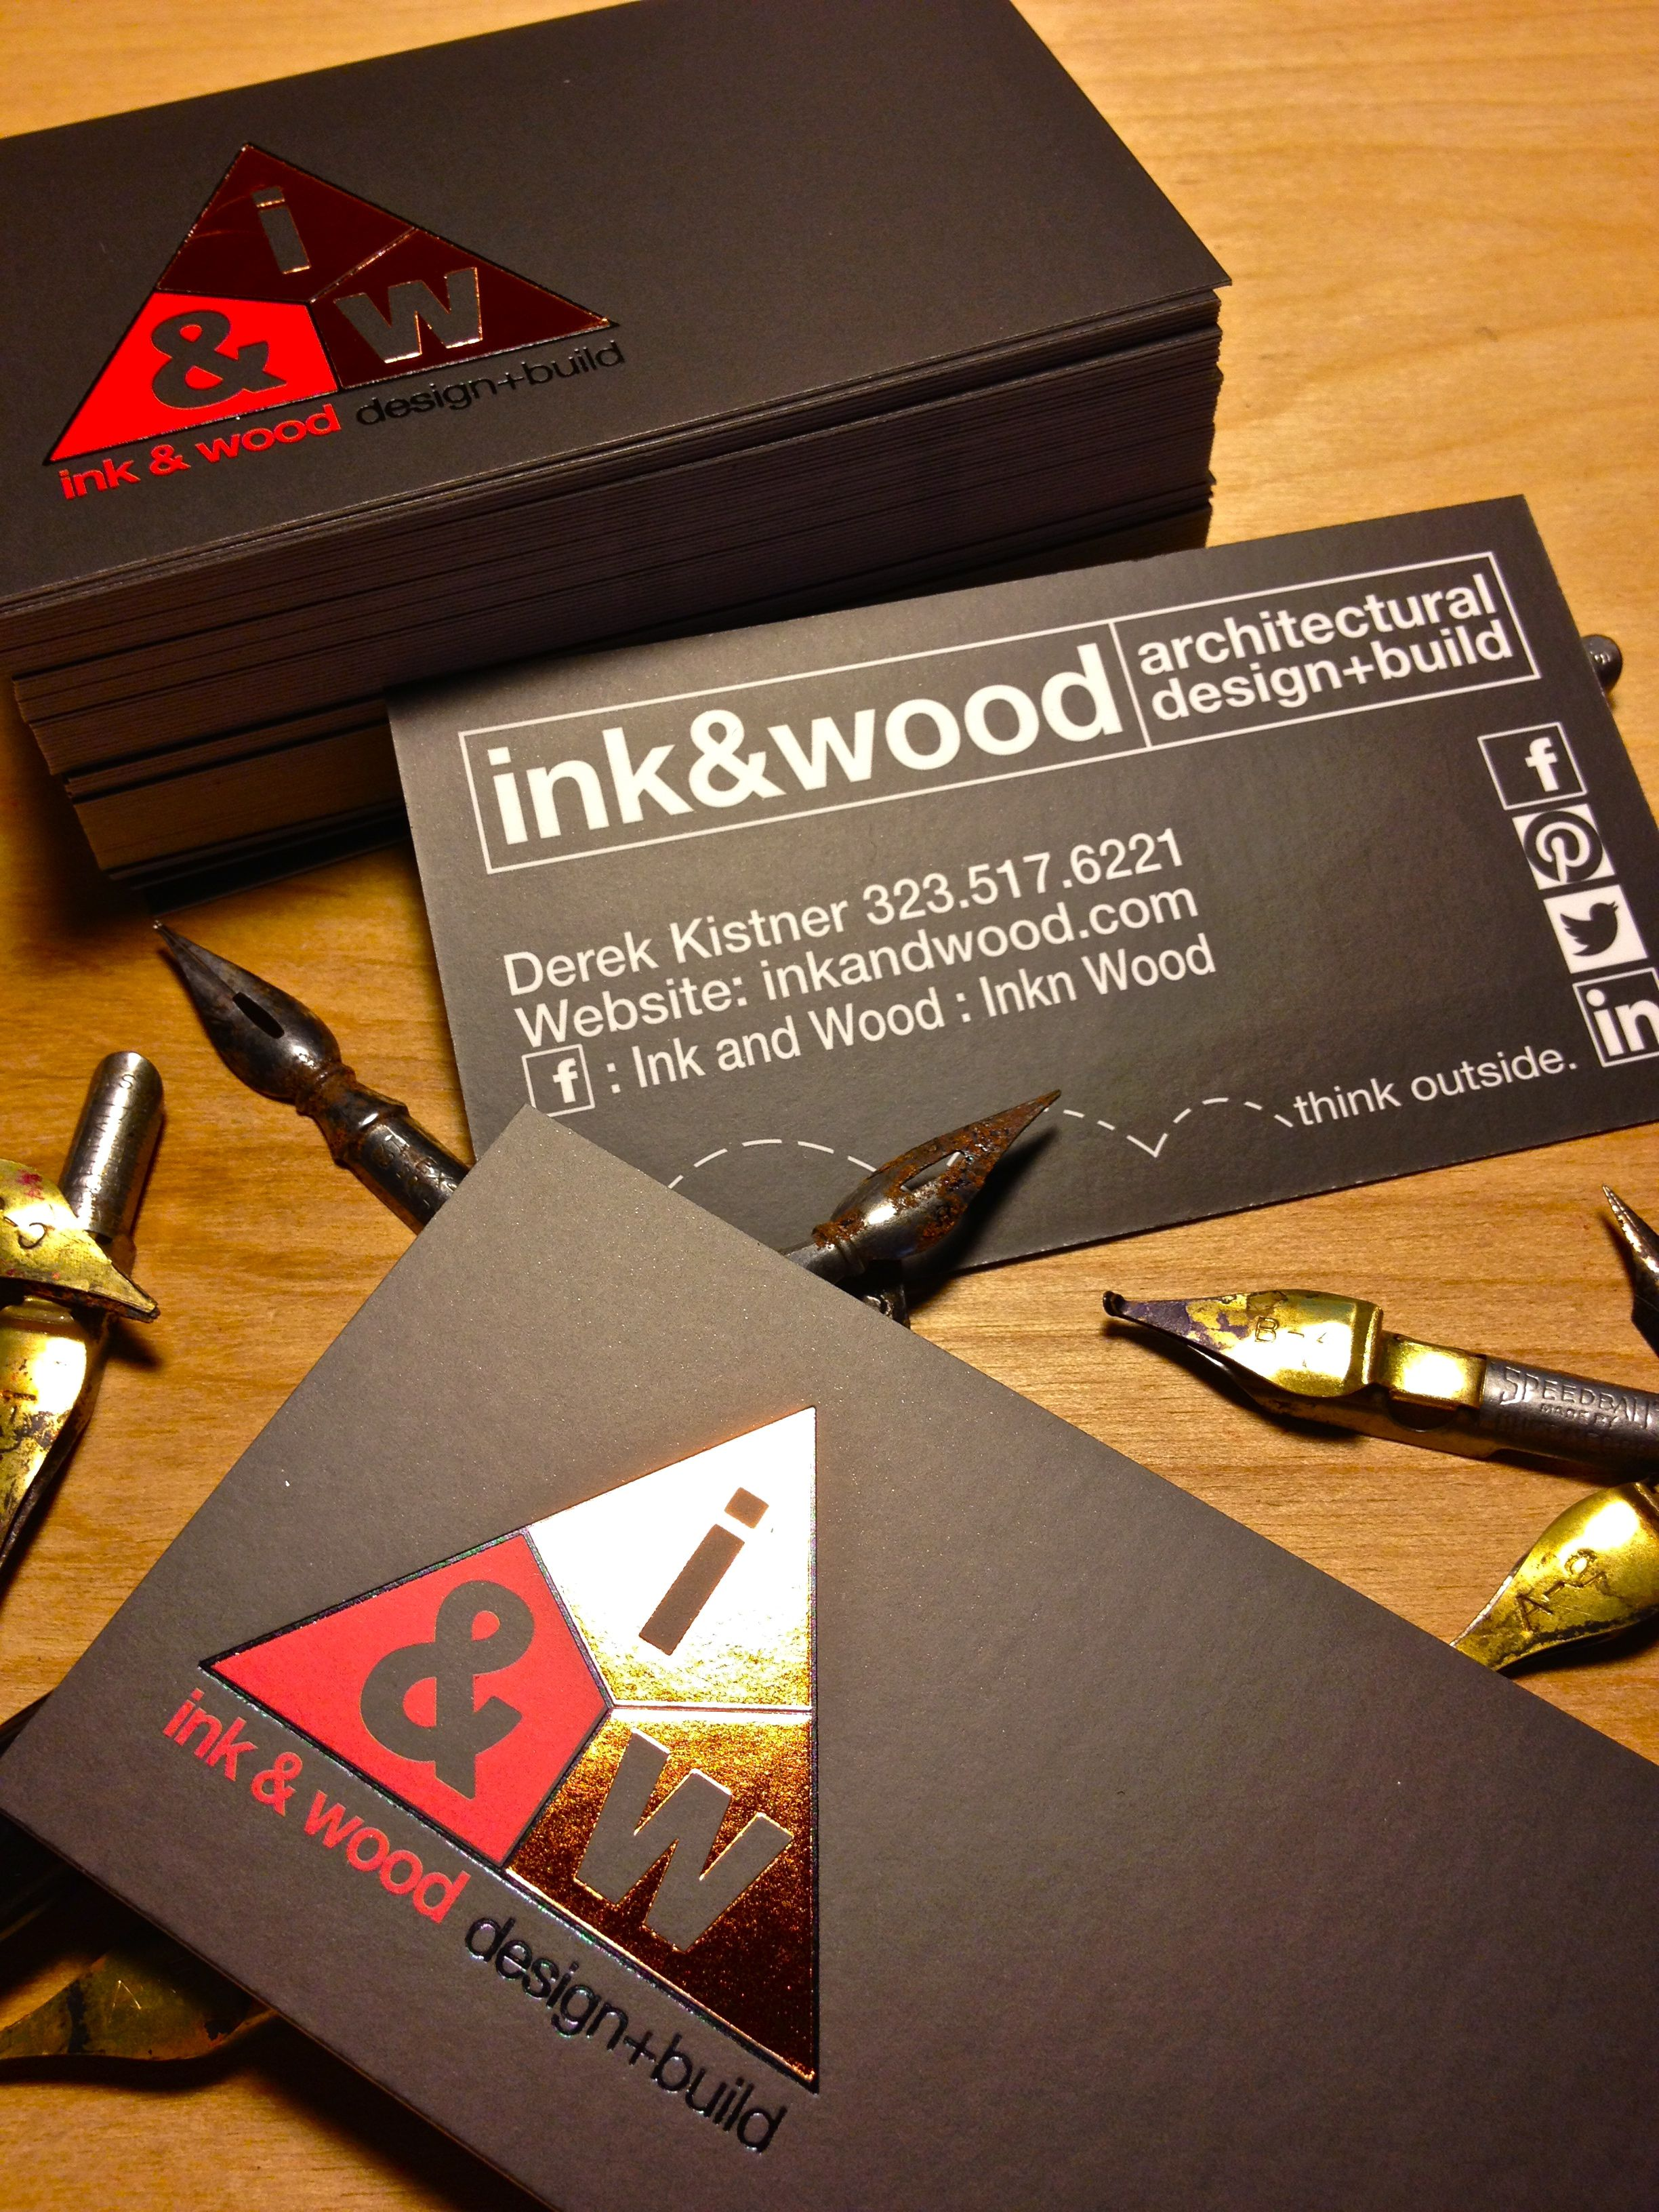 ink wood design build los angeles custom business cards